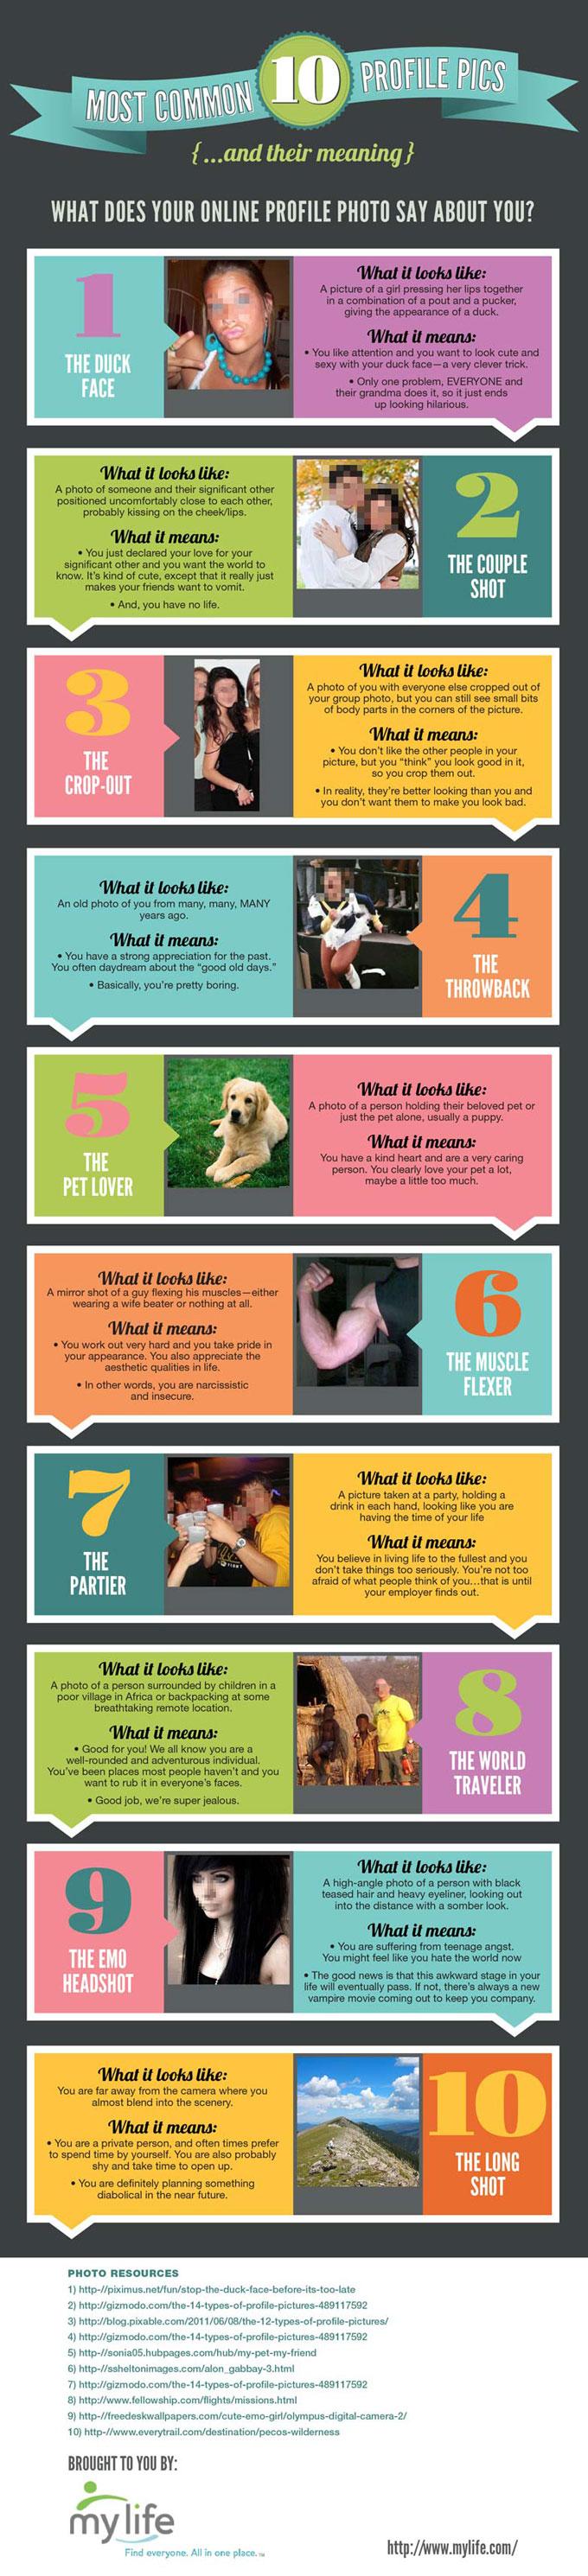 funny-profile-pics-infographic